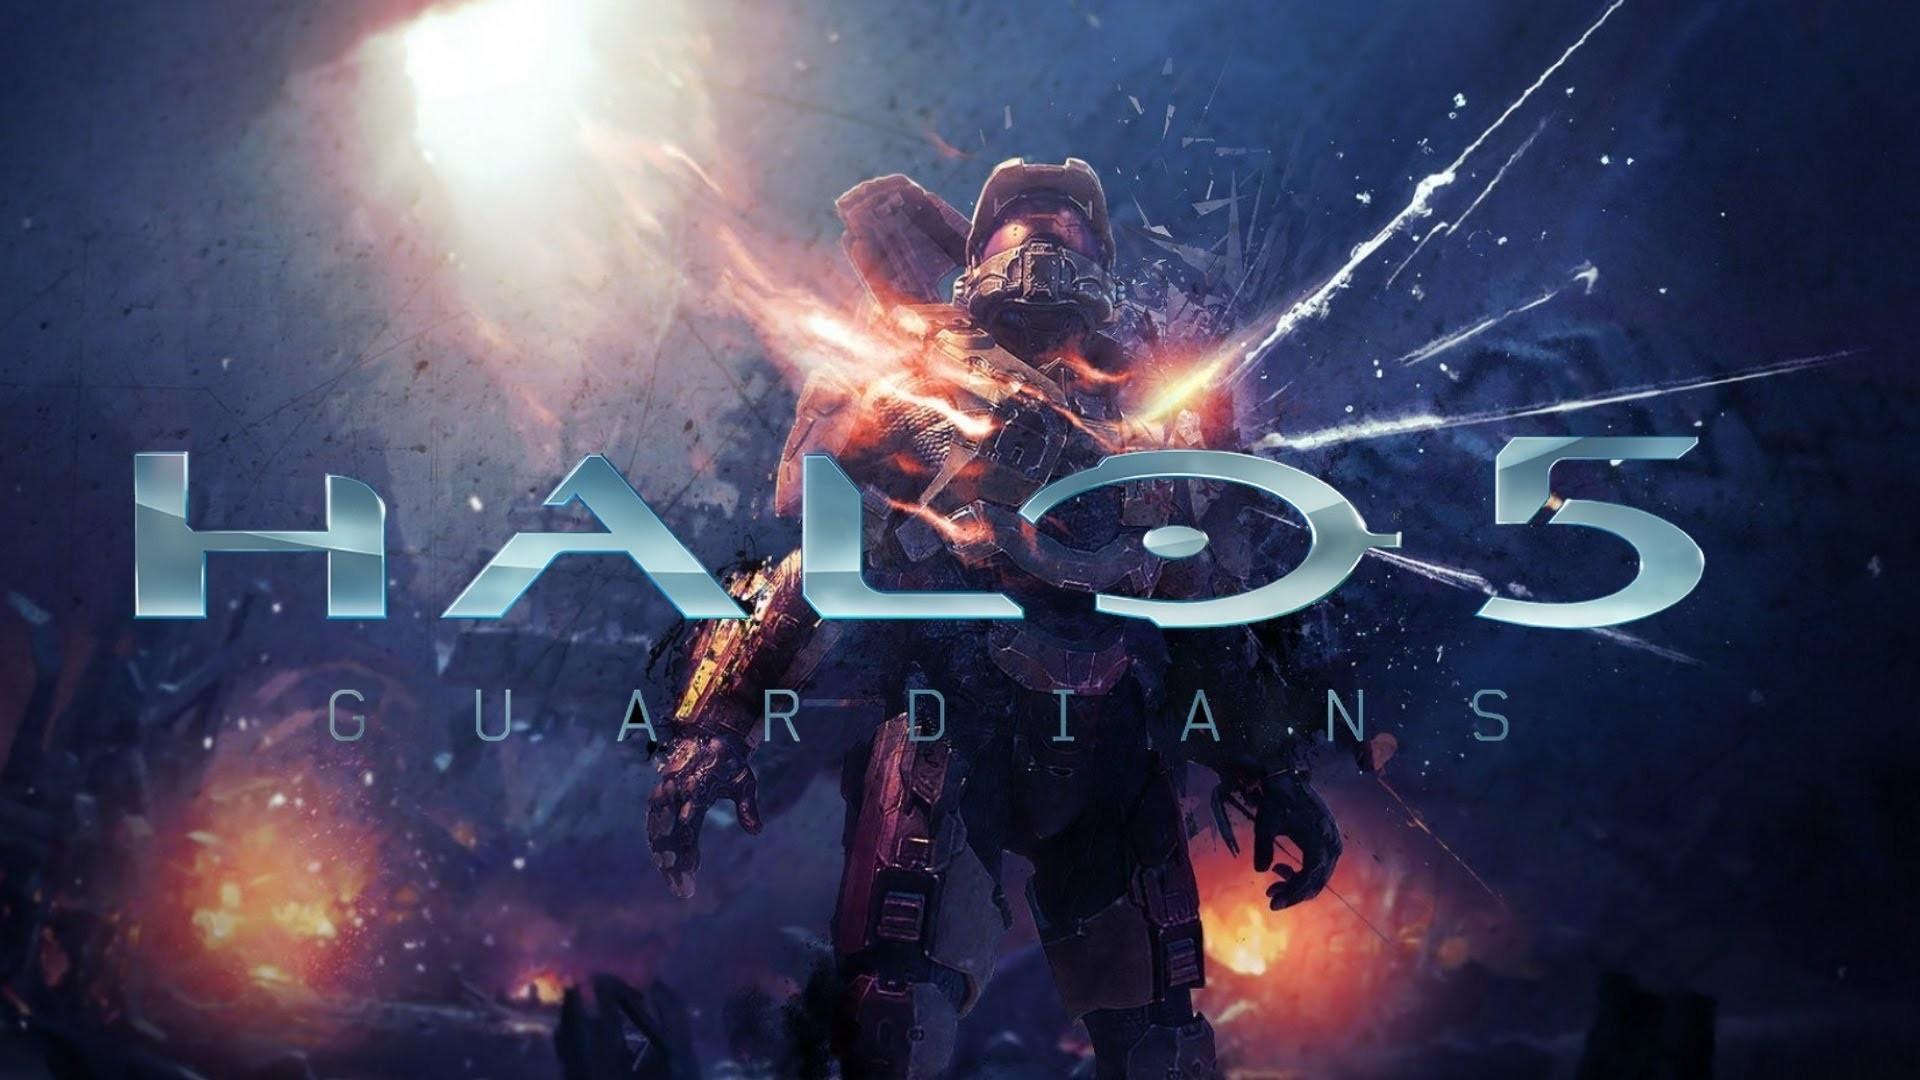 Halo 5 Guardians Journey Begins Trailer.